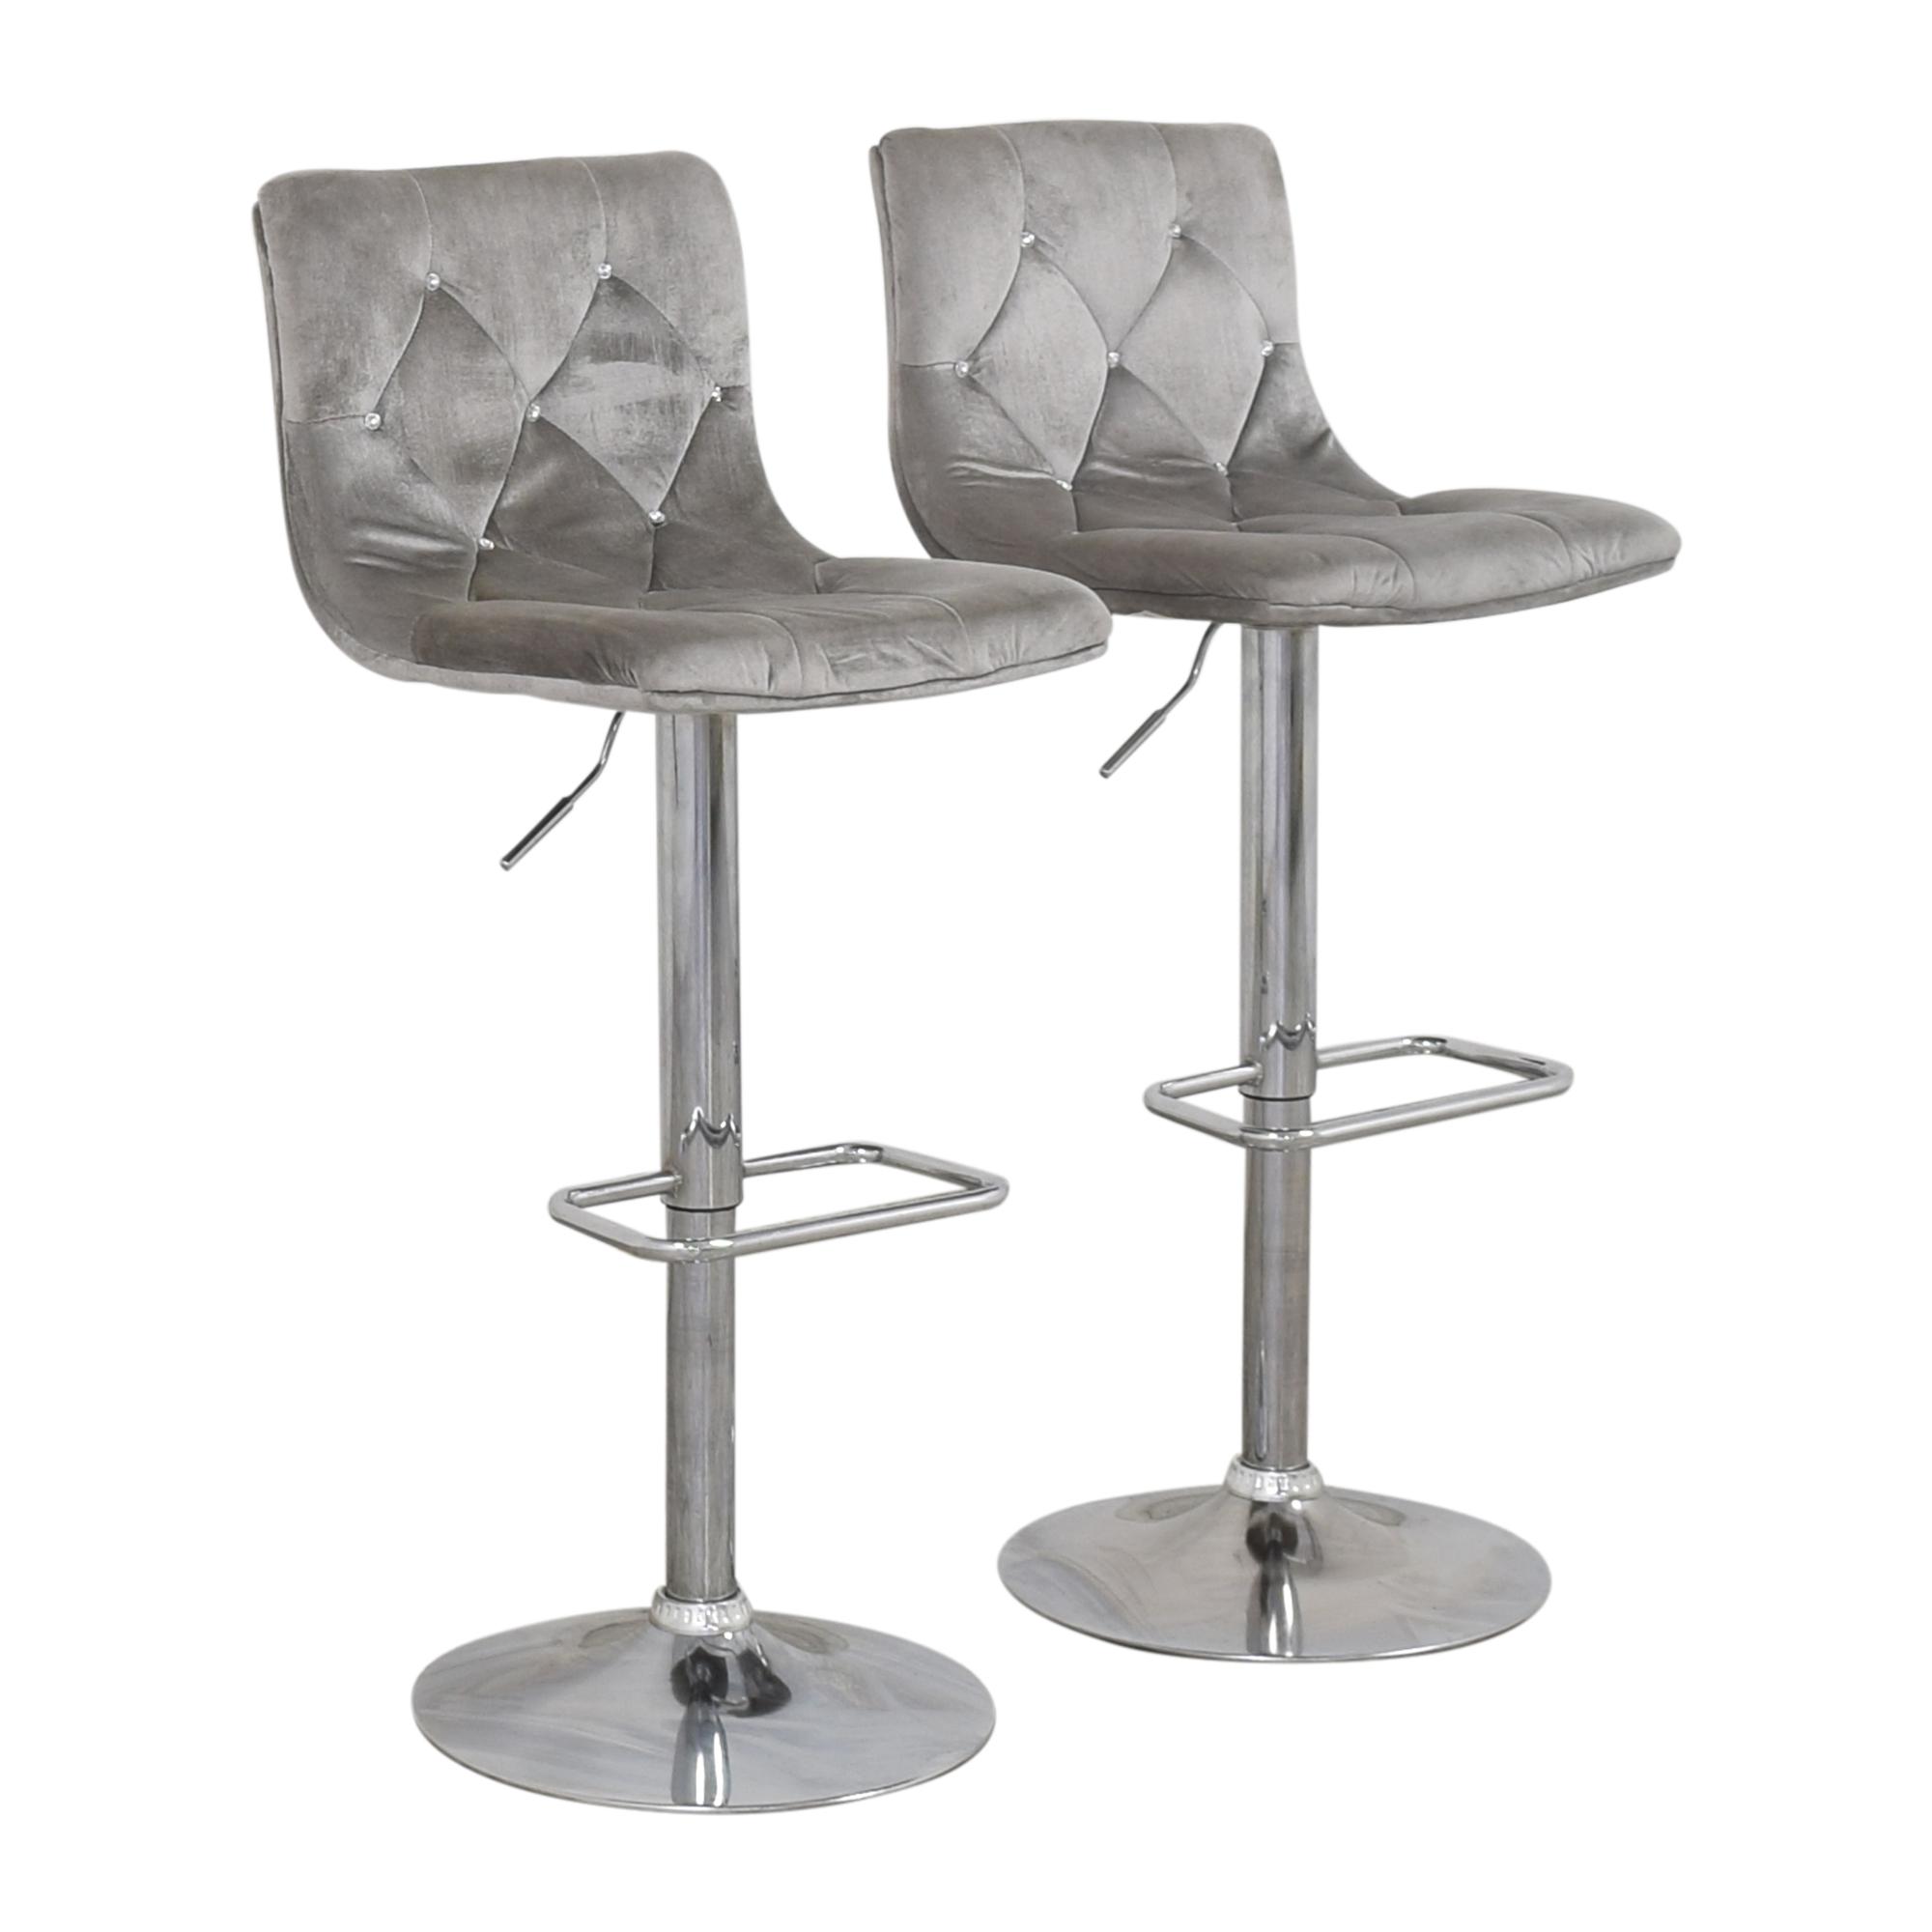 Diamond-Tufted Swivel Bar Stools Chairs